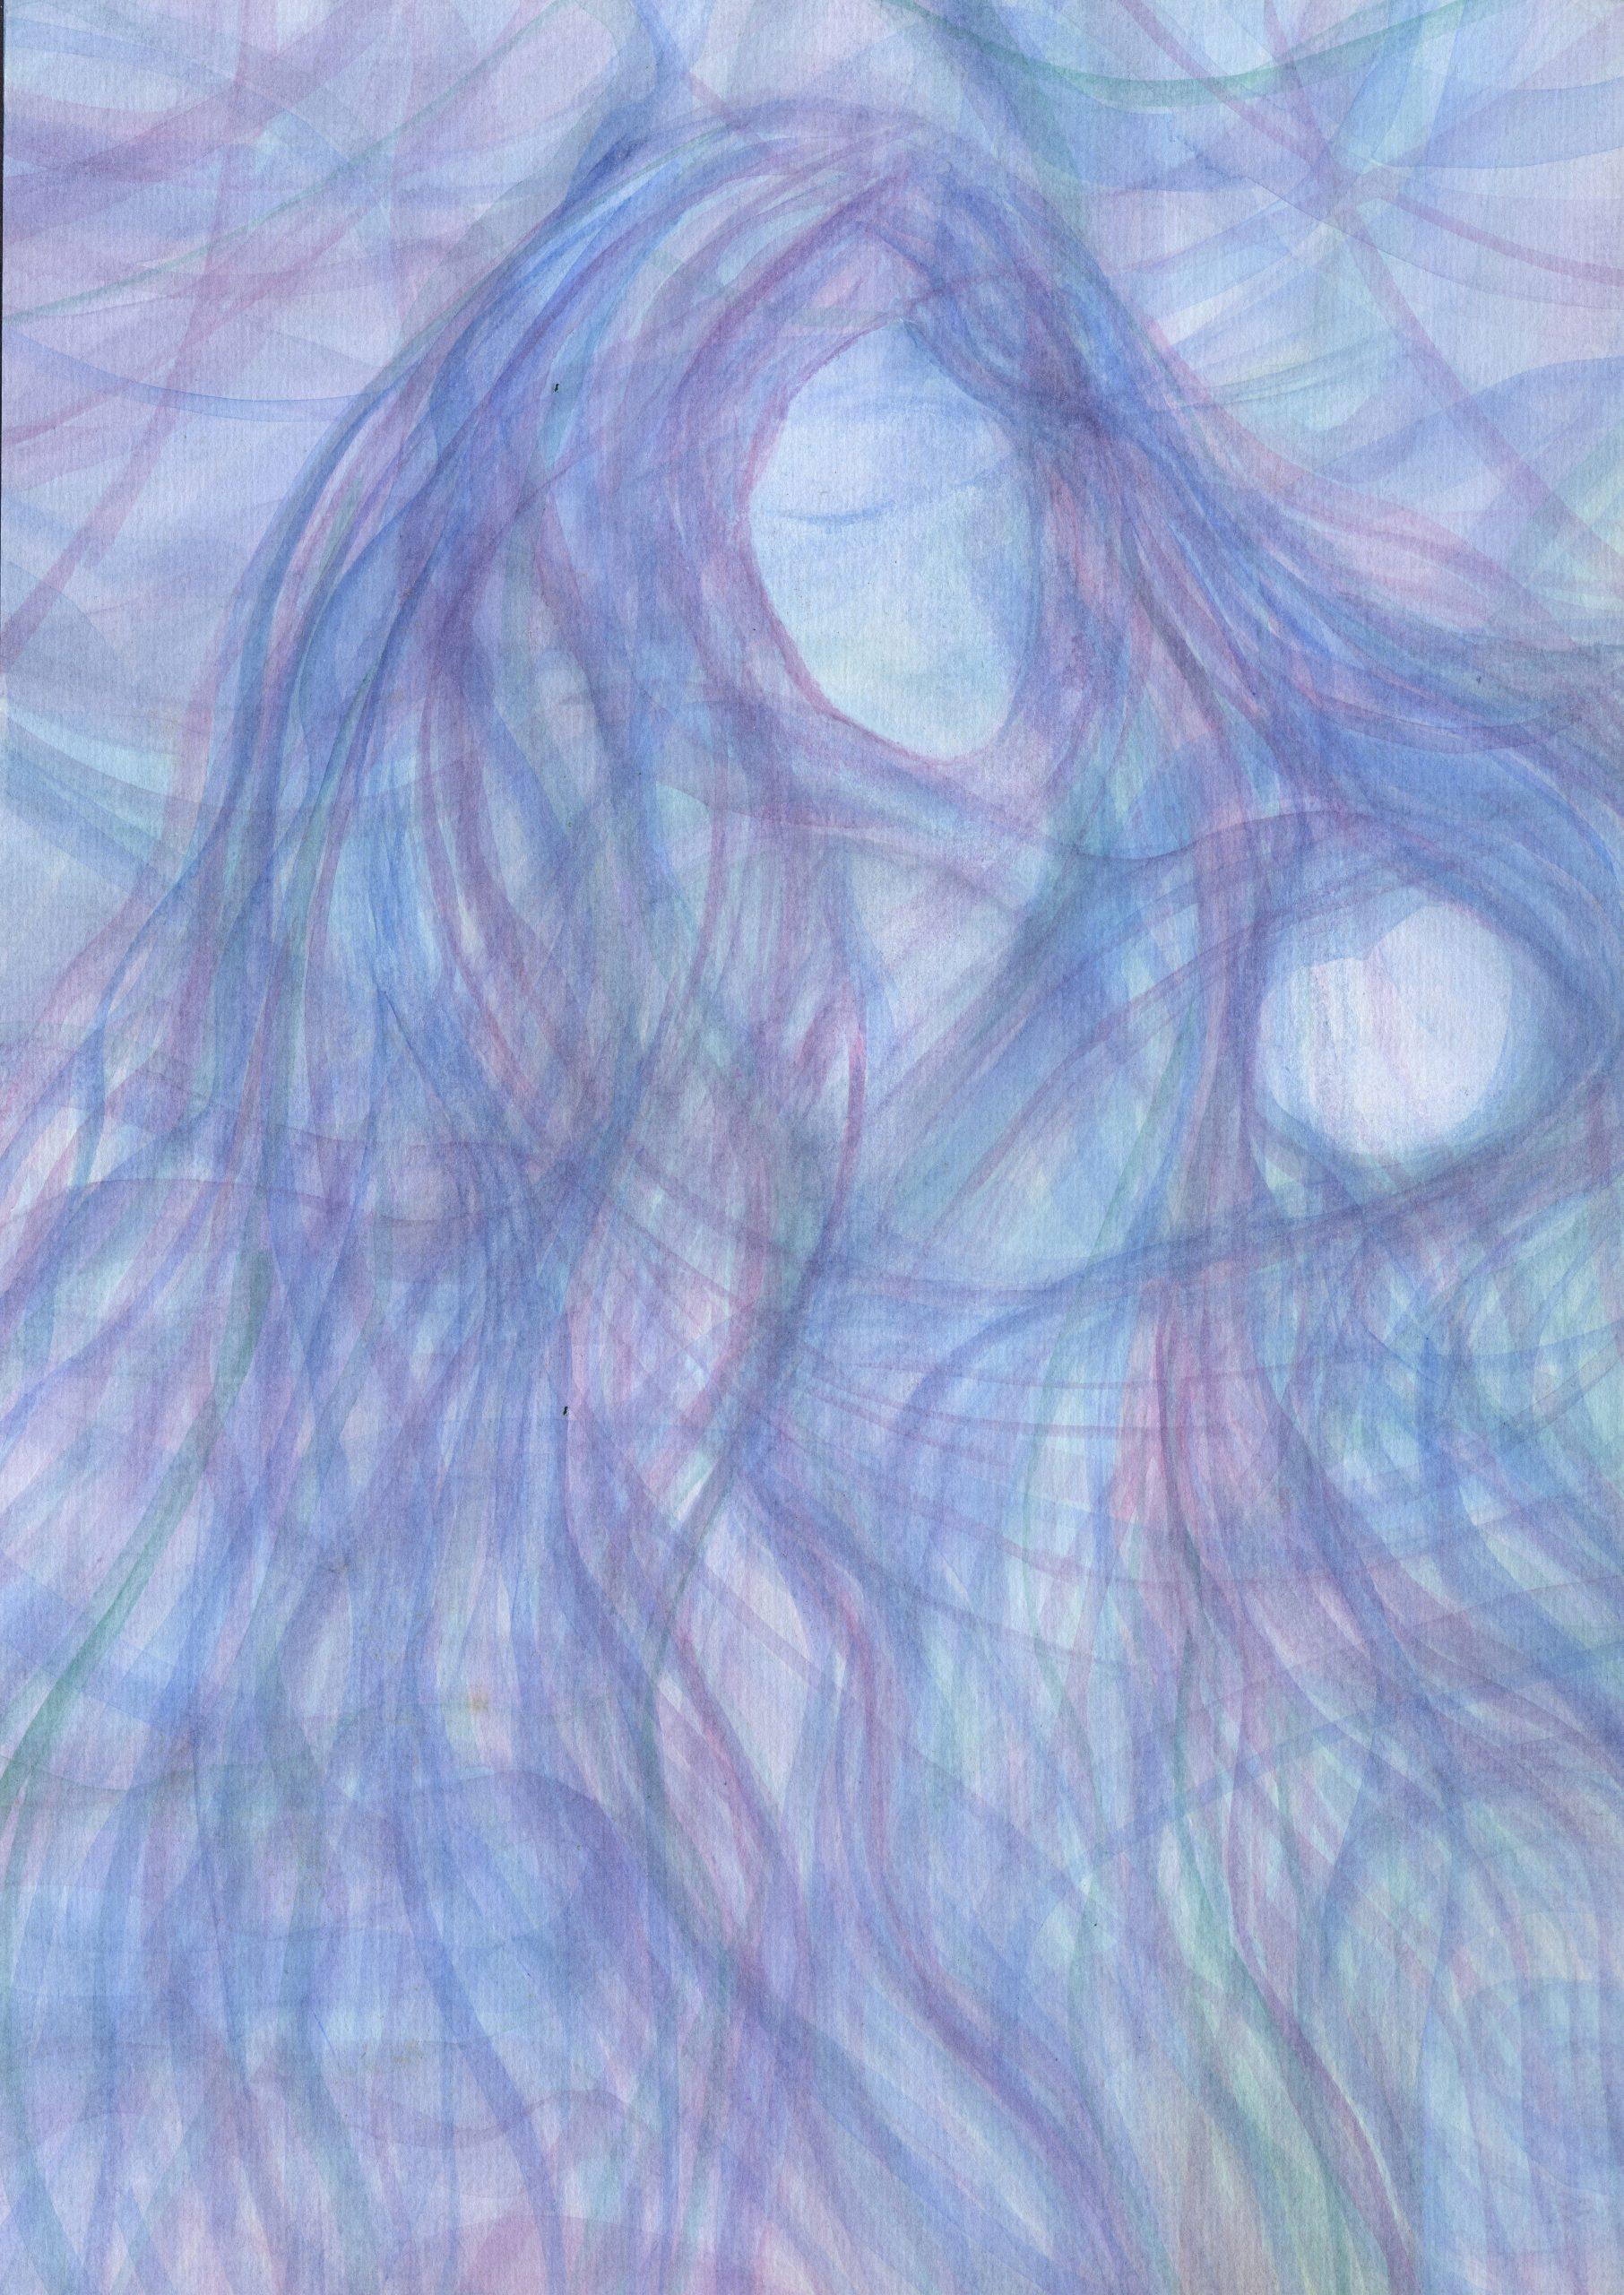 Motherhood - Veil Watercolor Painting - 11 X 15 - $325